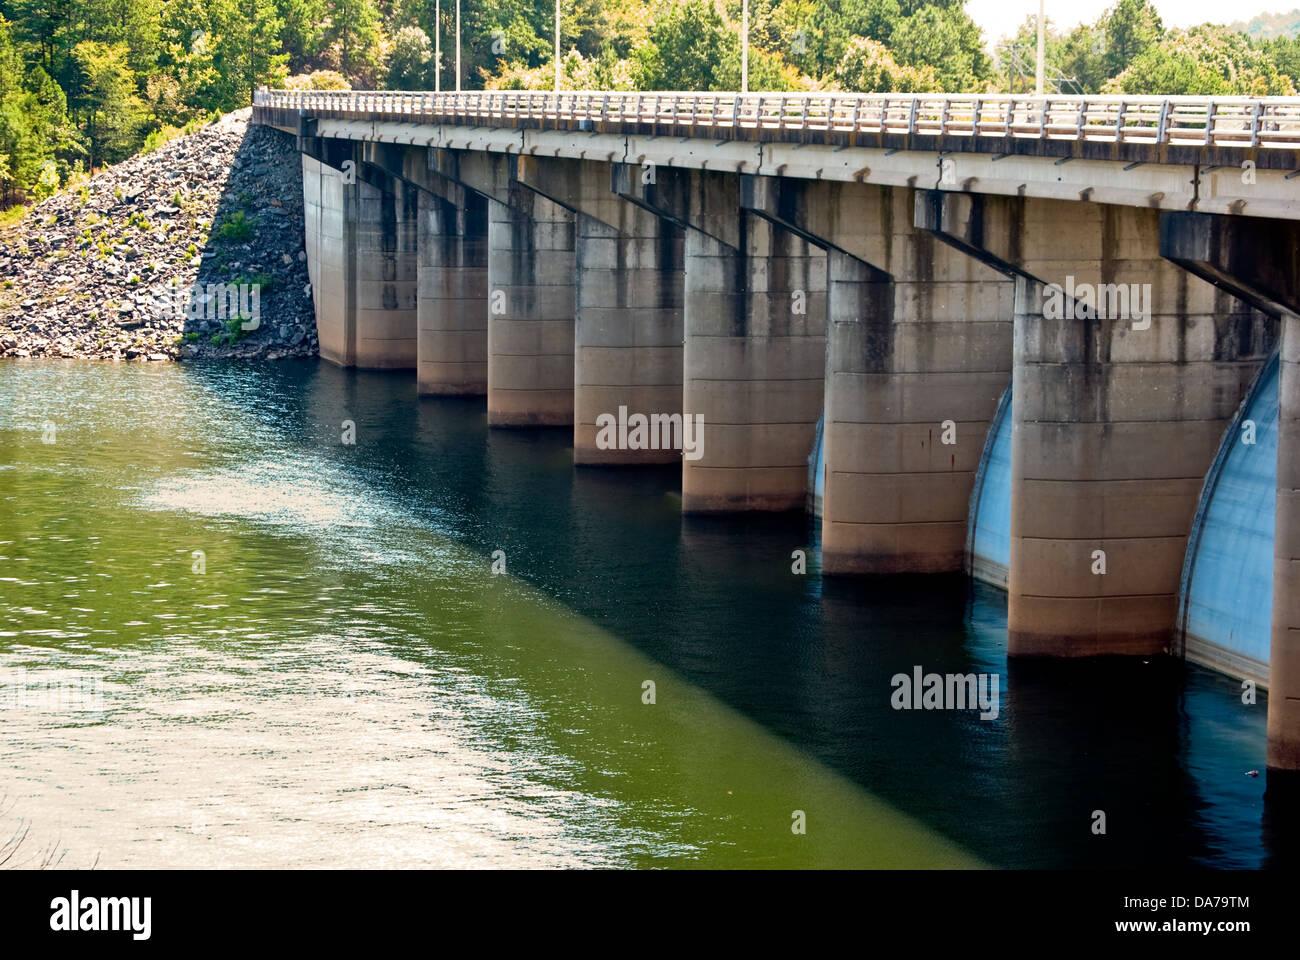 River dam in Oklahoma with a bridge - Stock Image